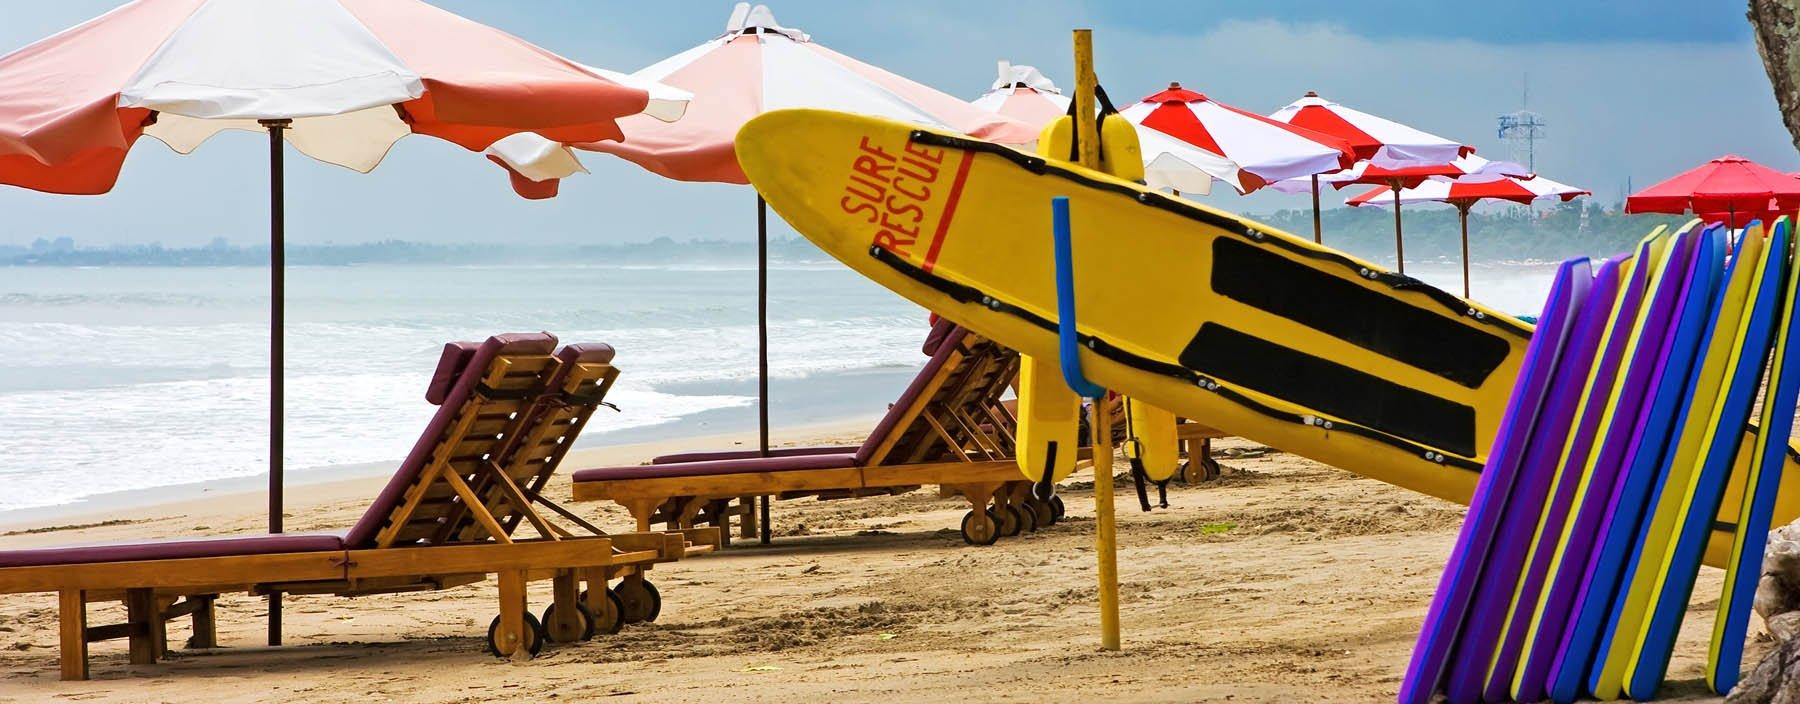 id, bali, kuta beach (3).jpg